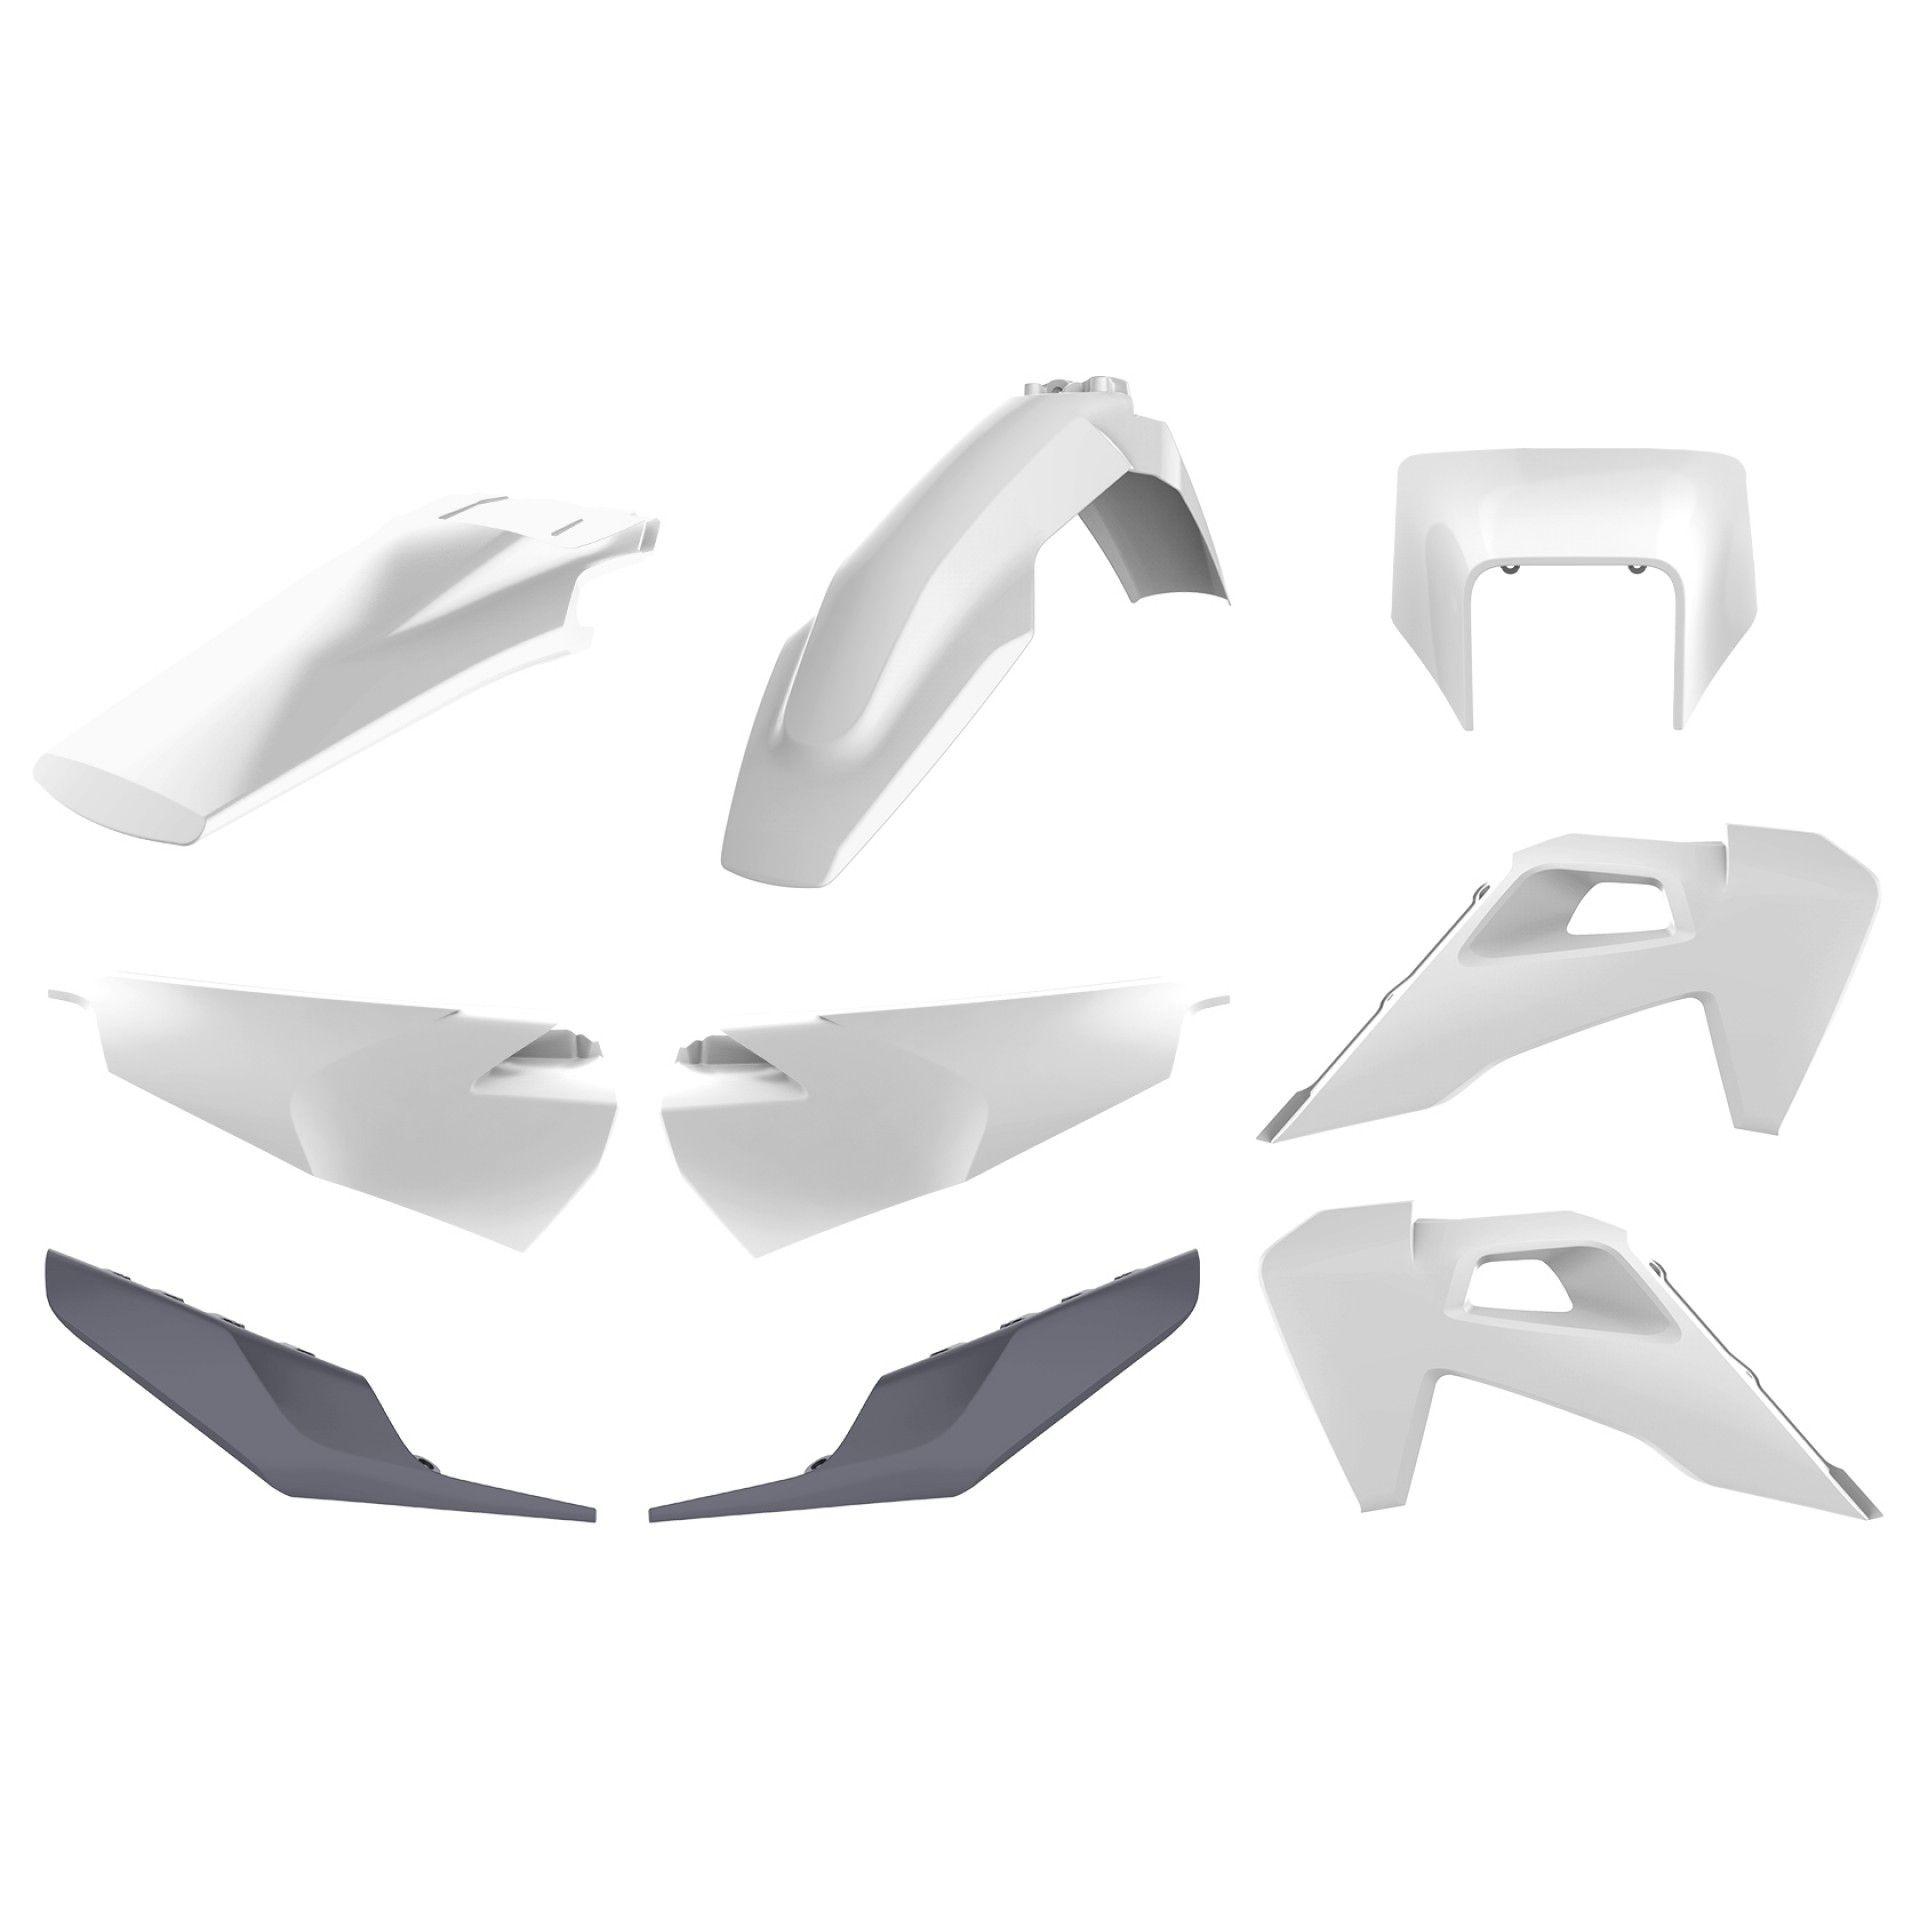 Kit Plástico Polisport Husqvarna Te Fe 250/300/350/450/501 2019...